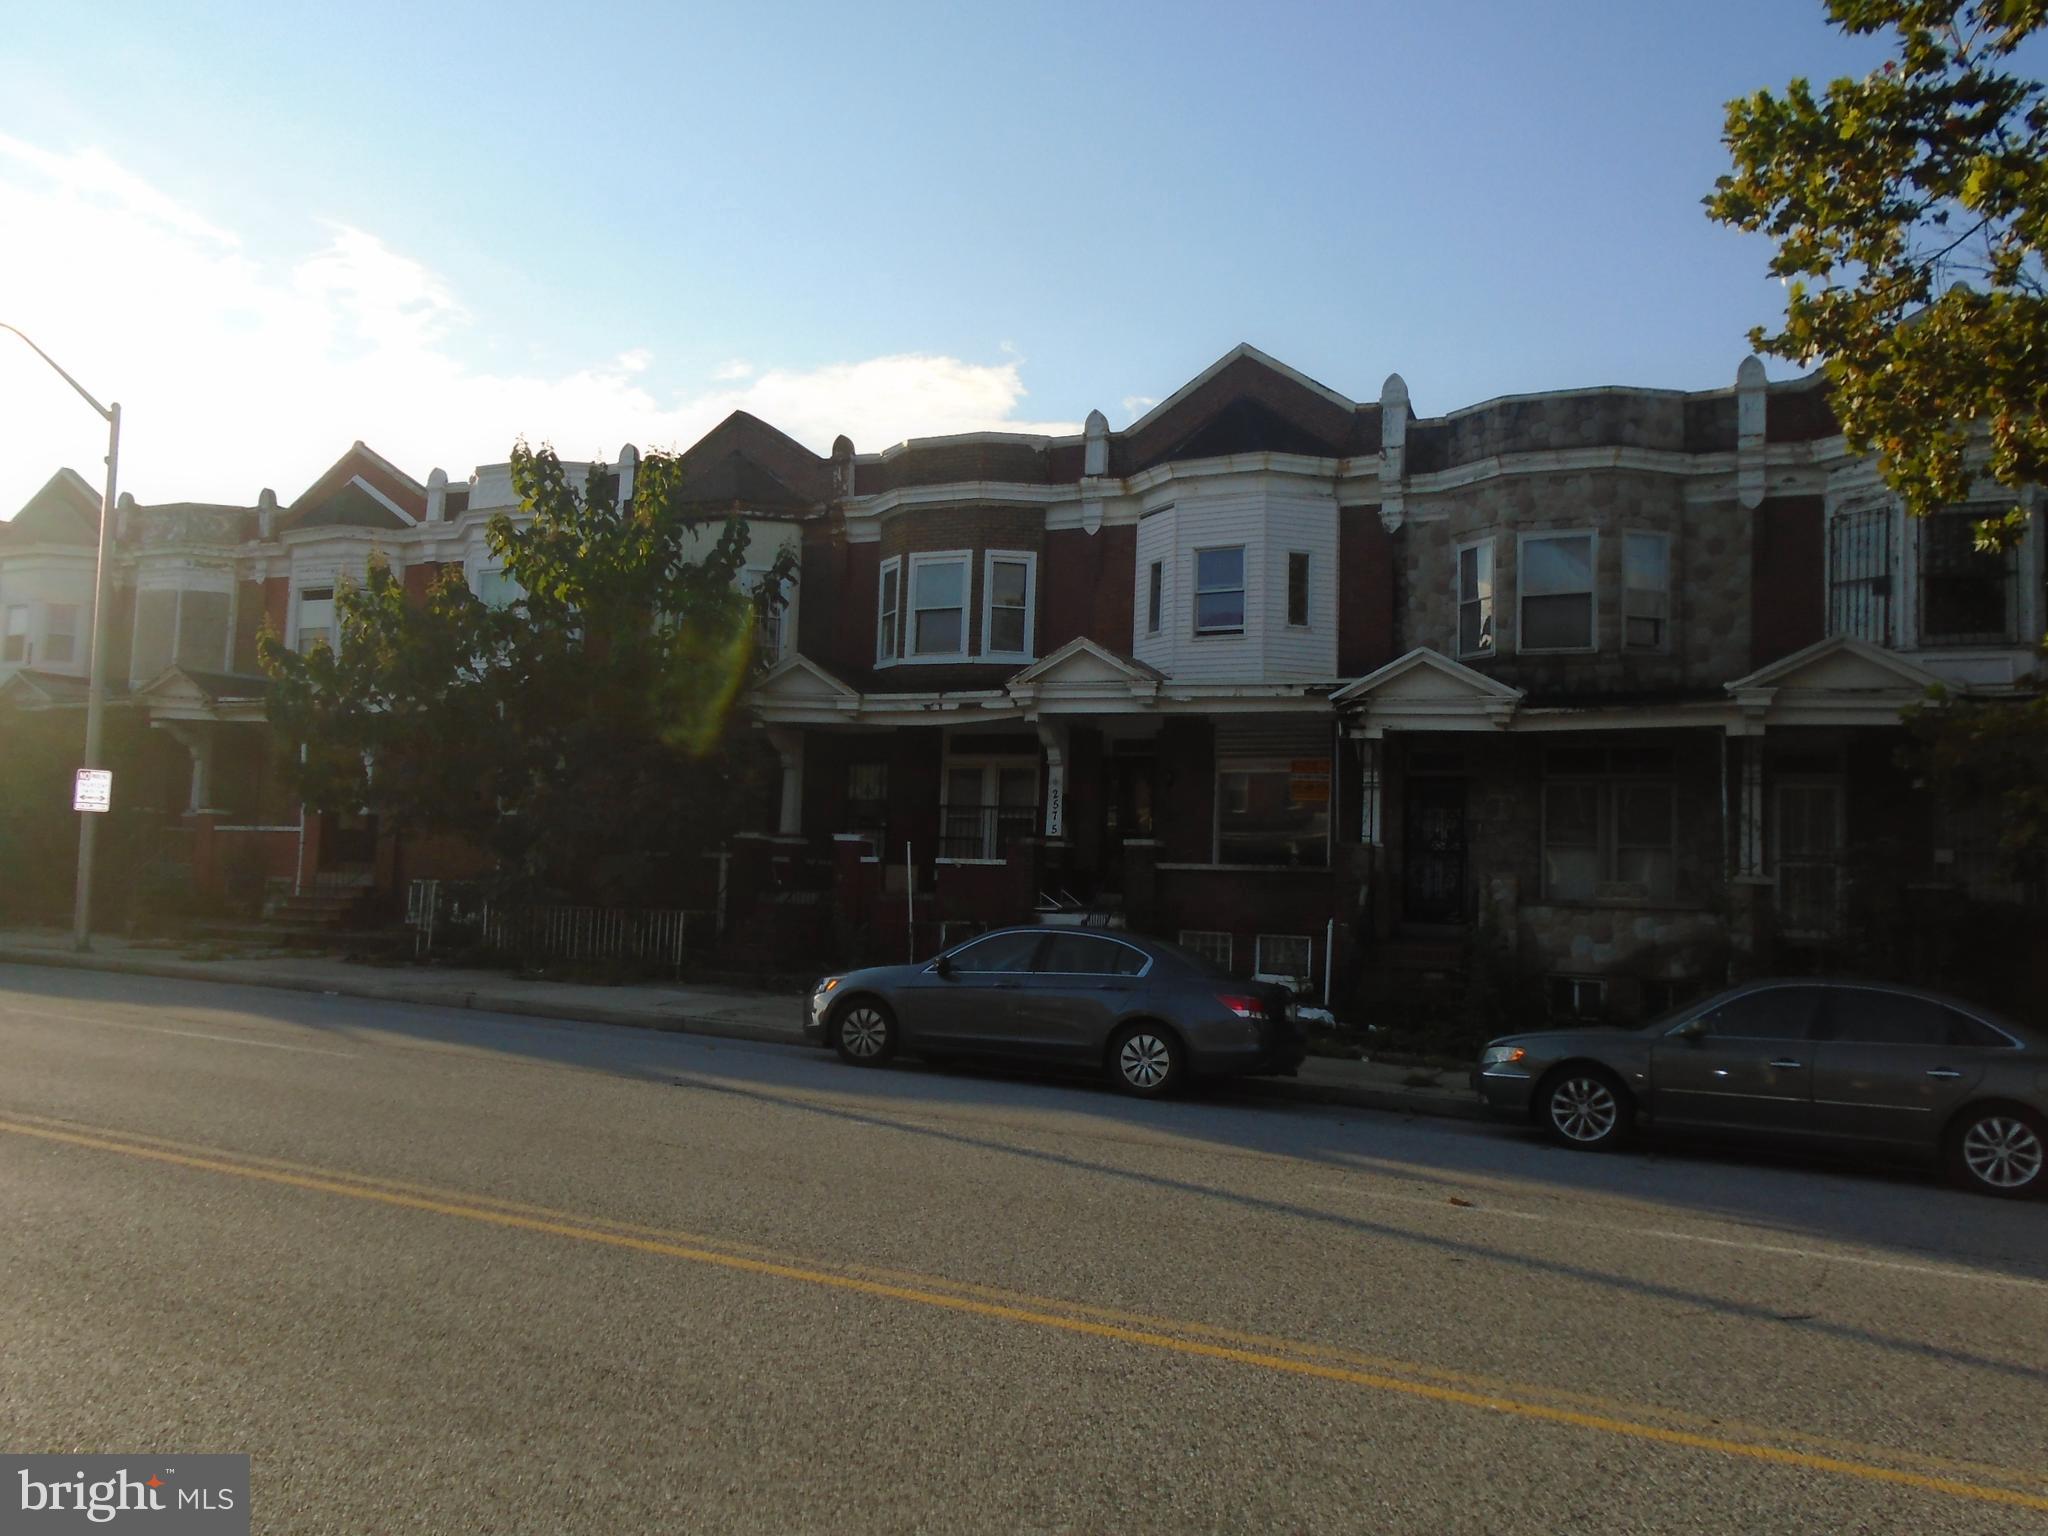 2575 EDMONDSON AVENUE, Baltimore, MD 21223